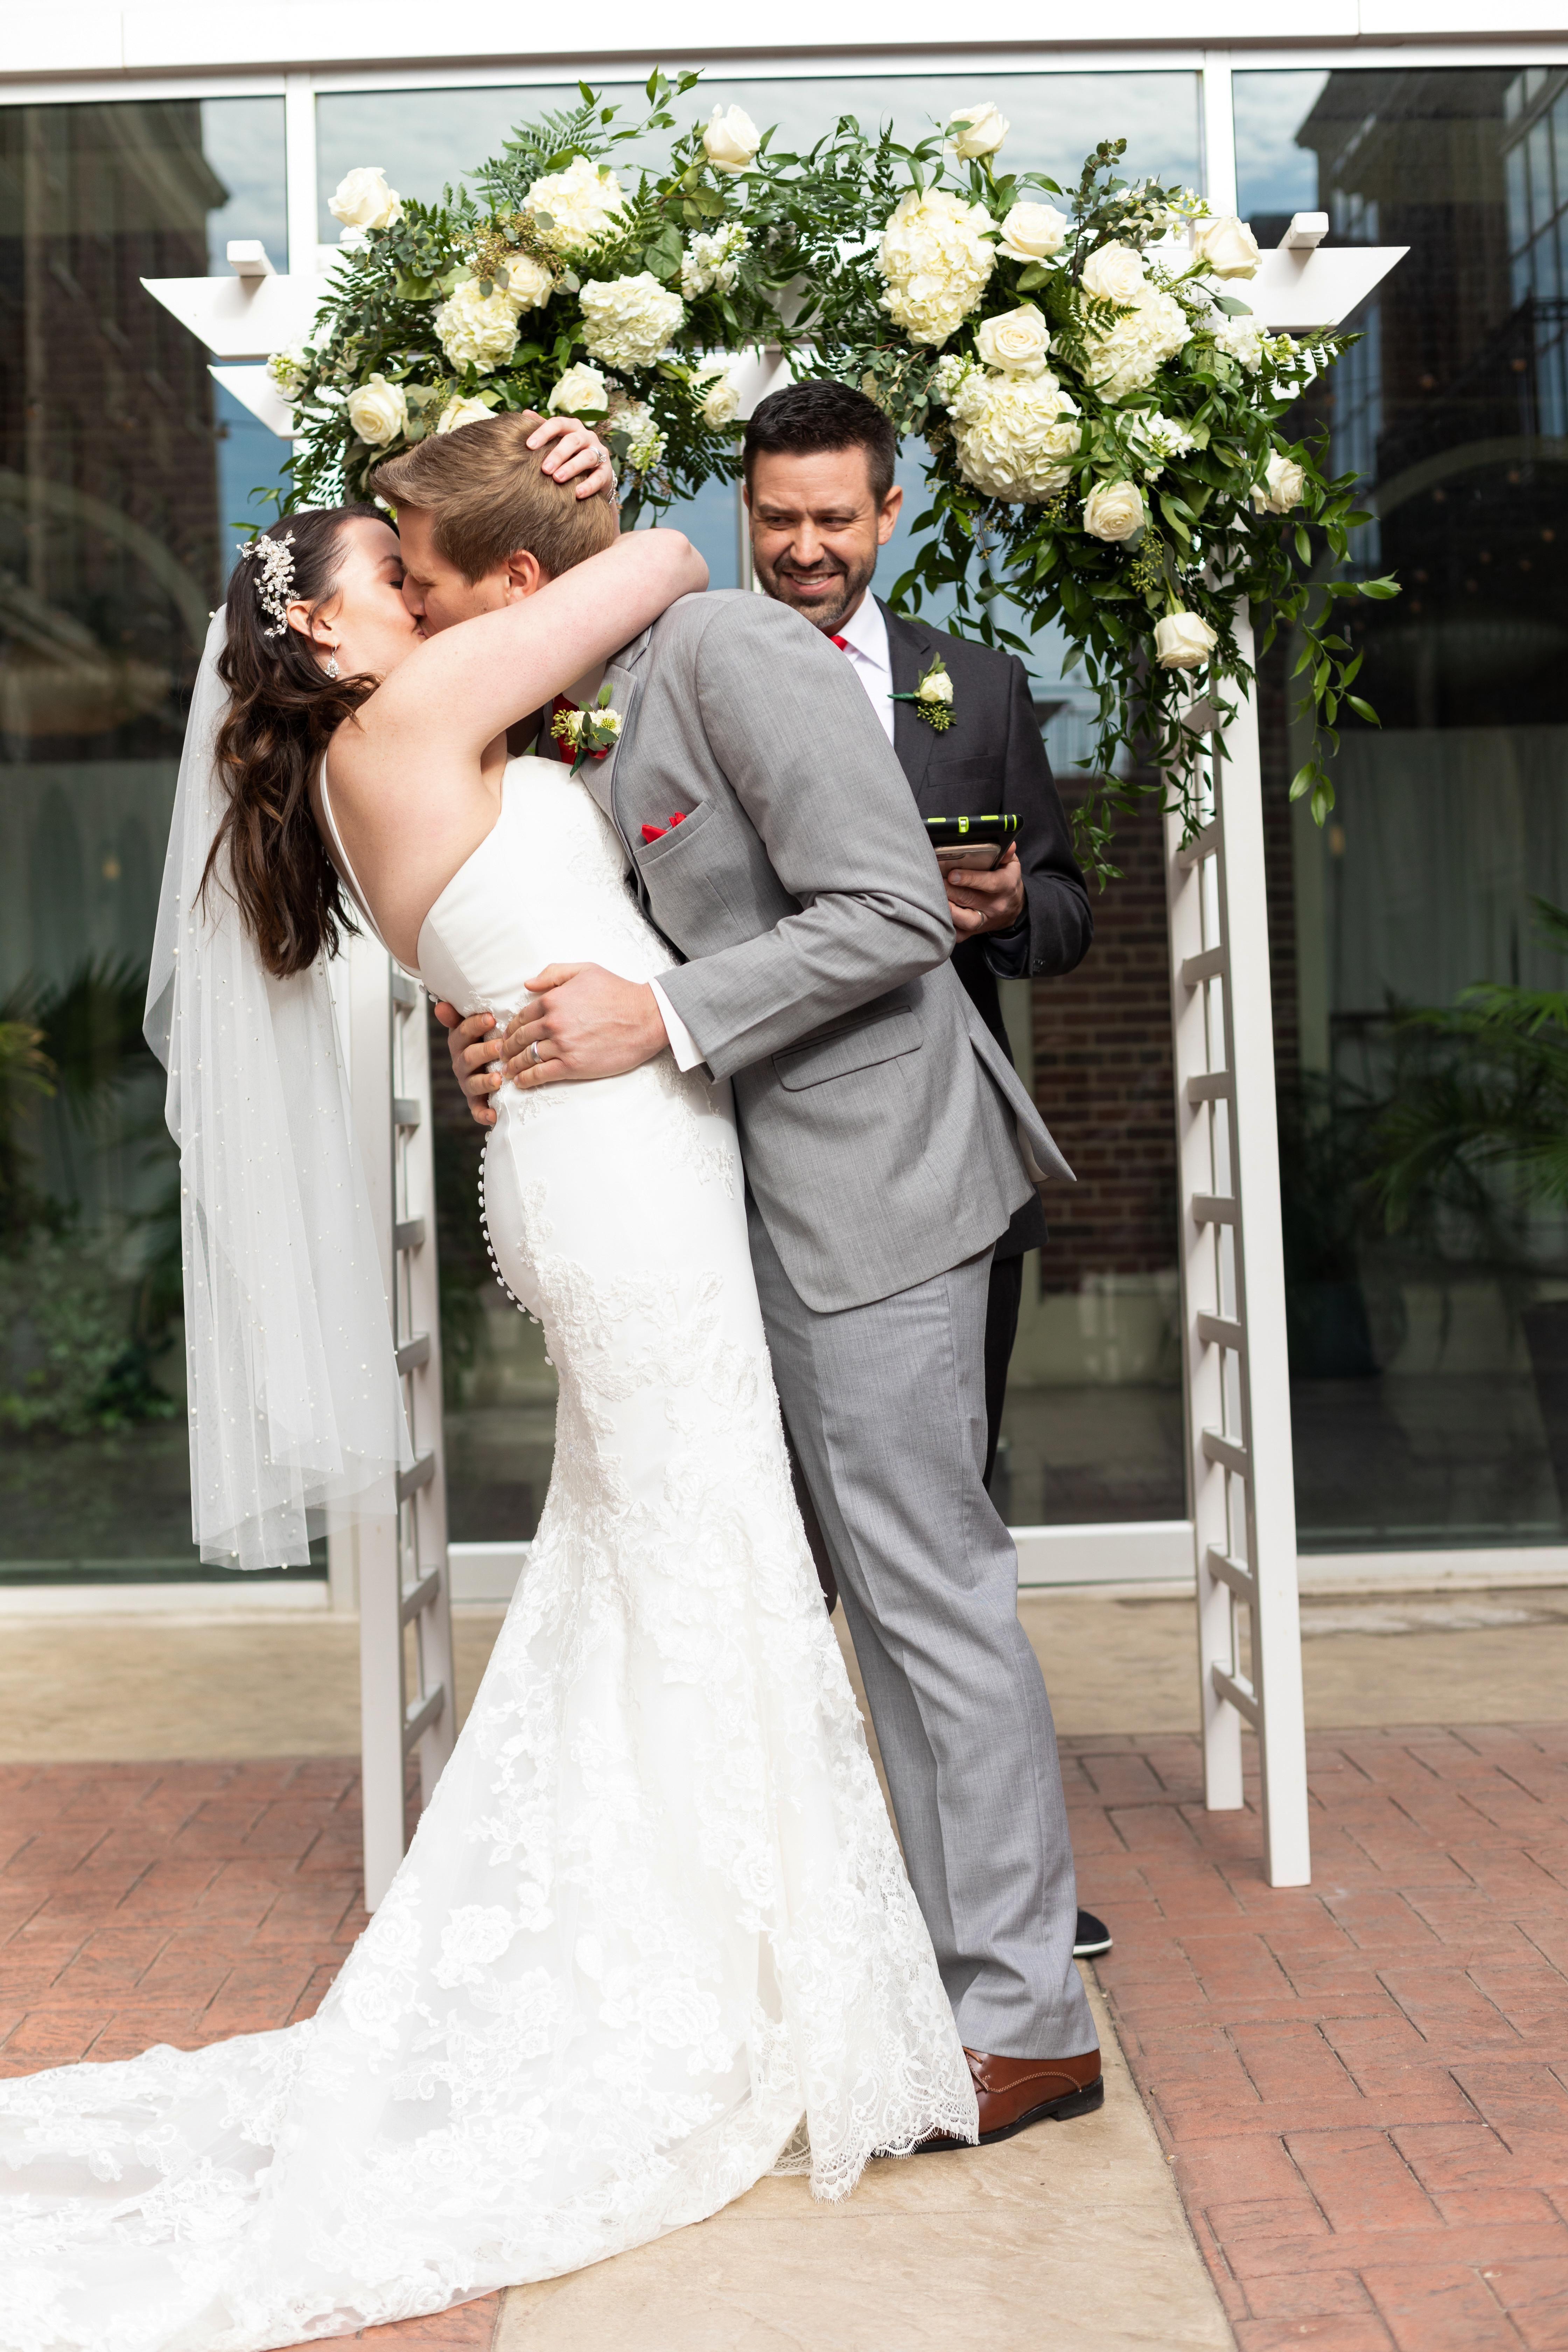 Wedding Video Of Your Dreams In 2020 Wedding Film Wedding Video Wedding Films Videos